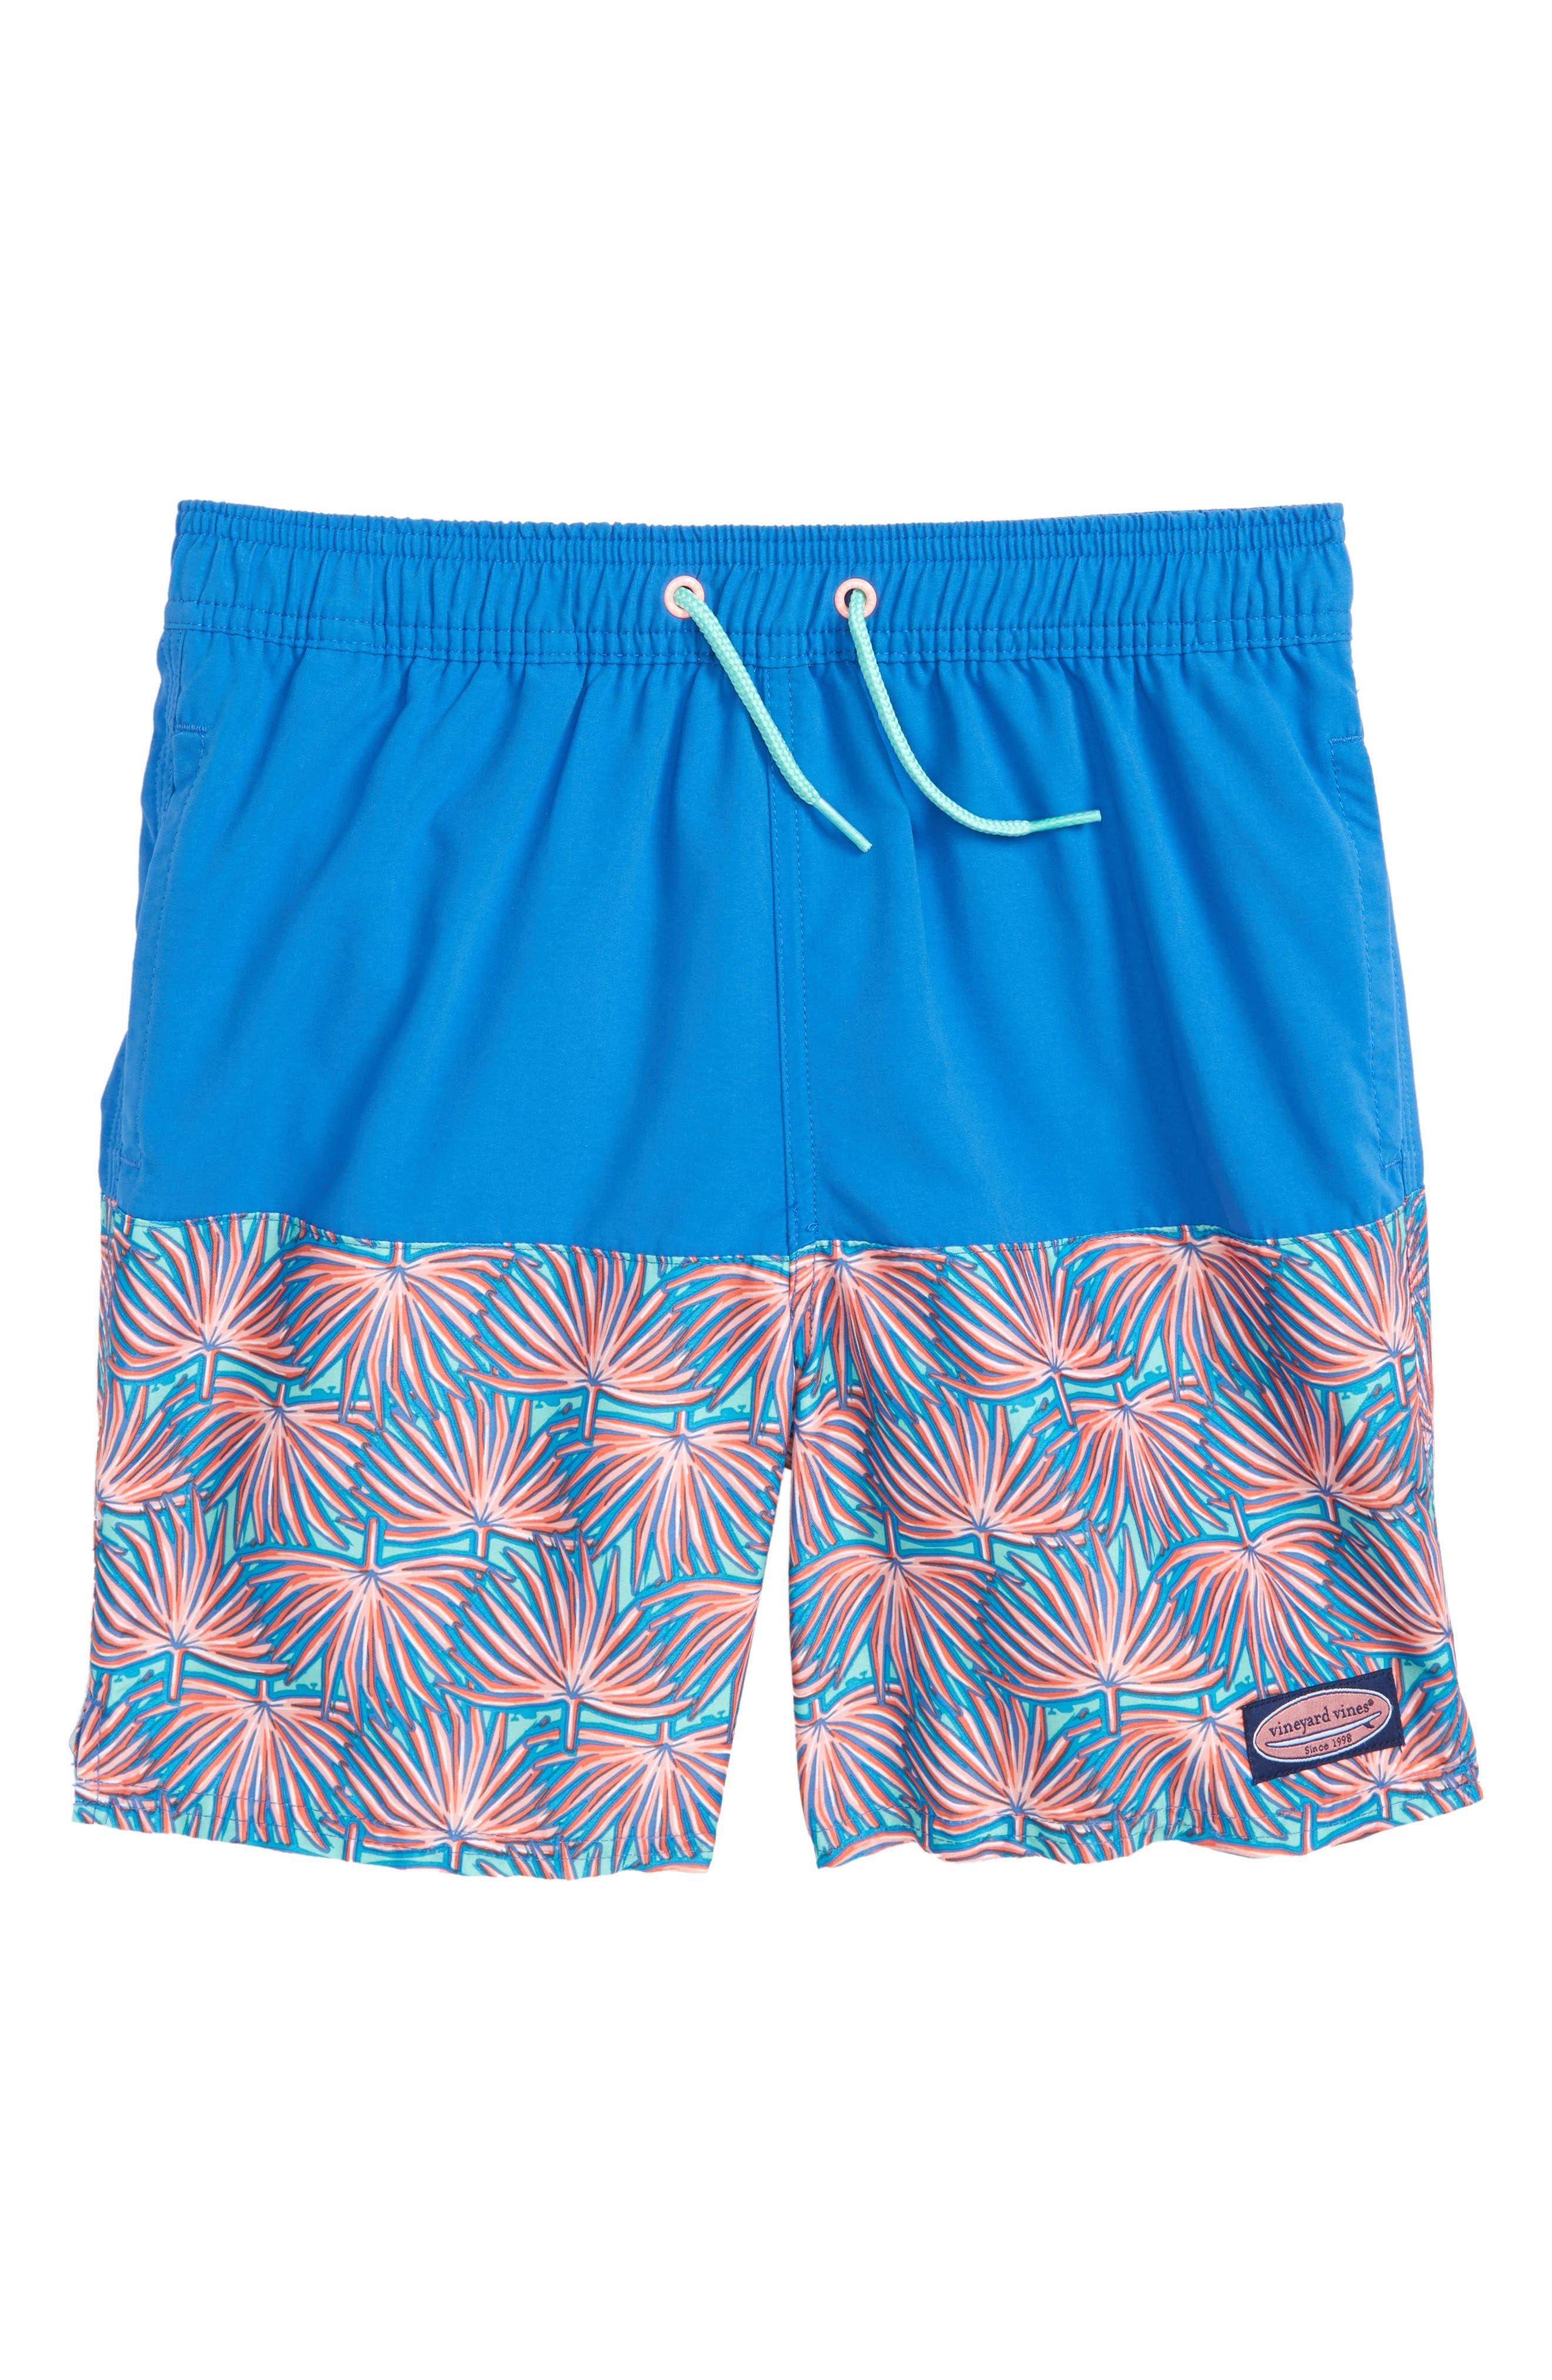 Chappy Fan Palm Print Swim Trunks,                         Main,                         color, Capri Blue